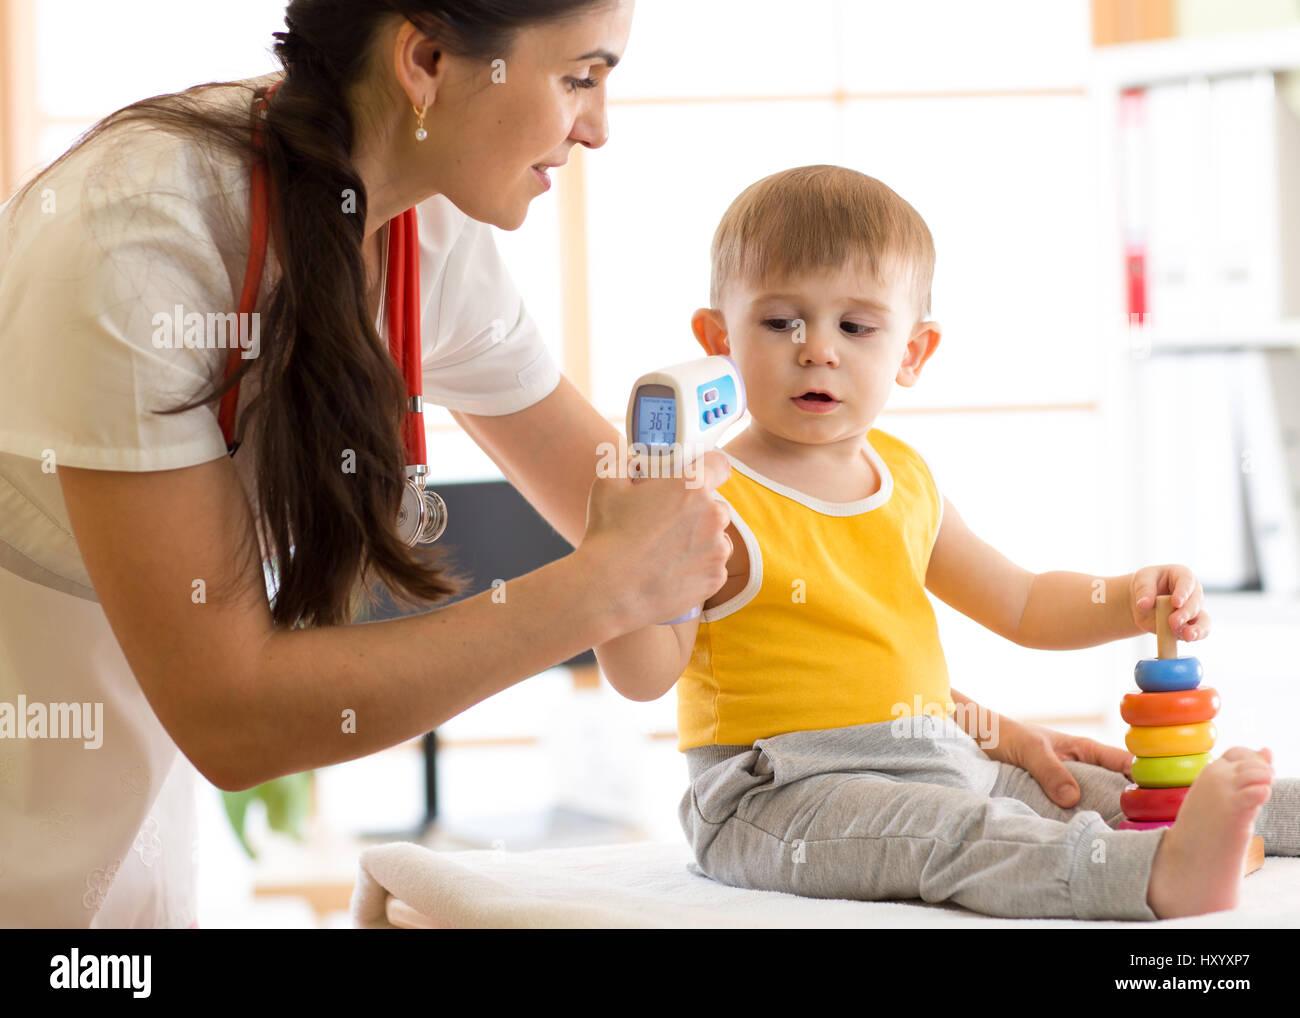 doctor measuring temperature cute kid - Stock Image